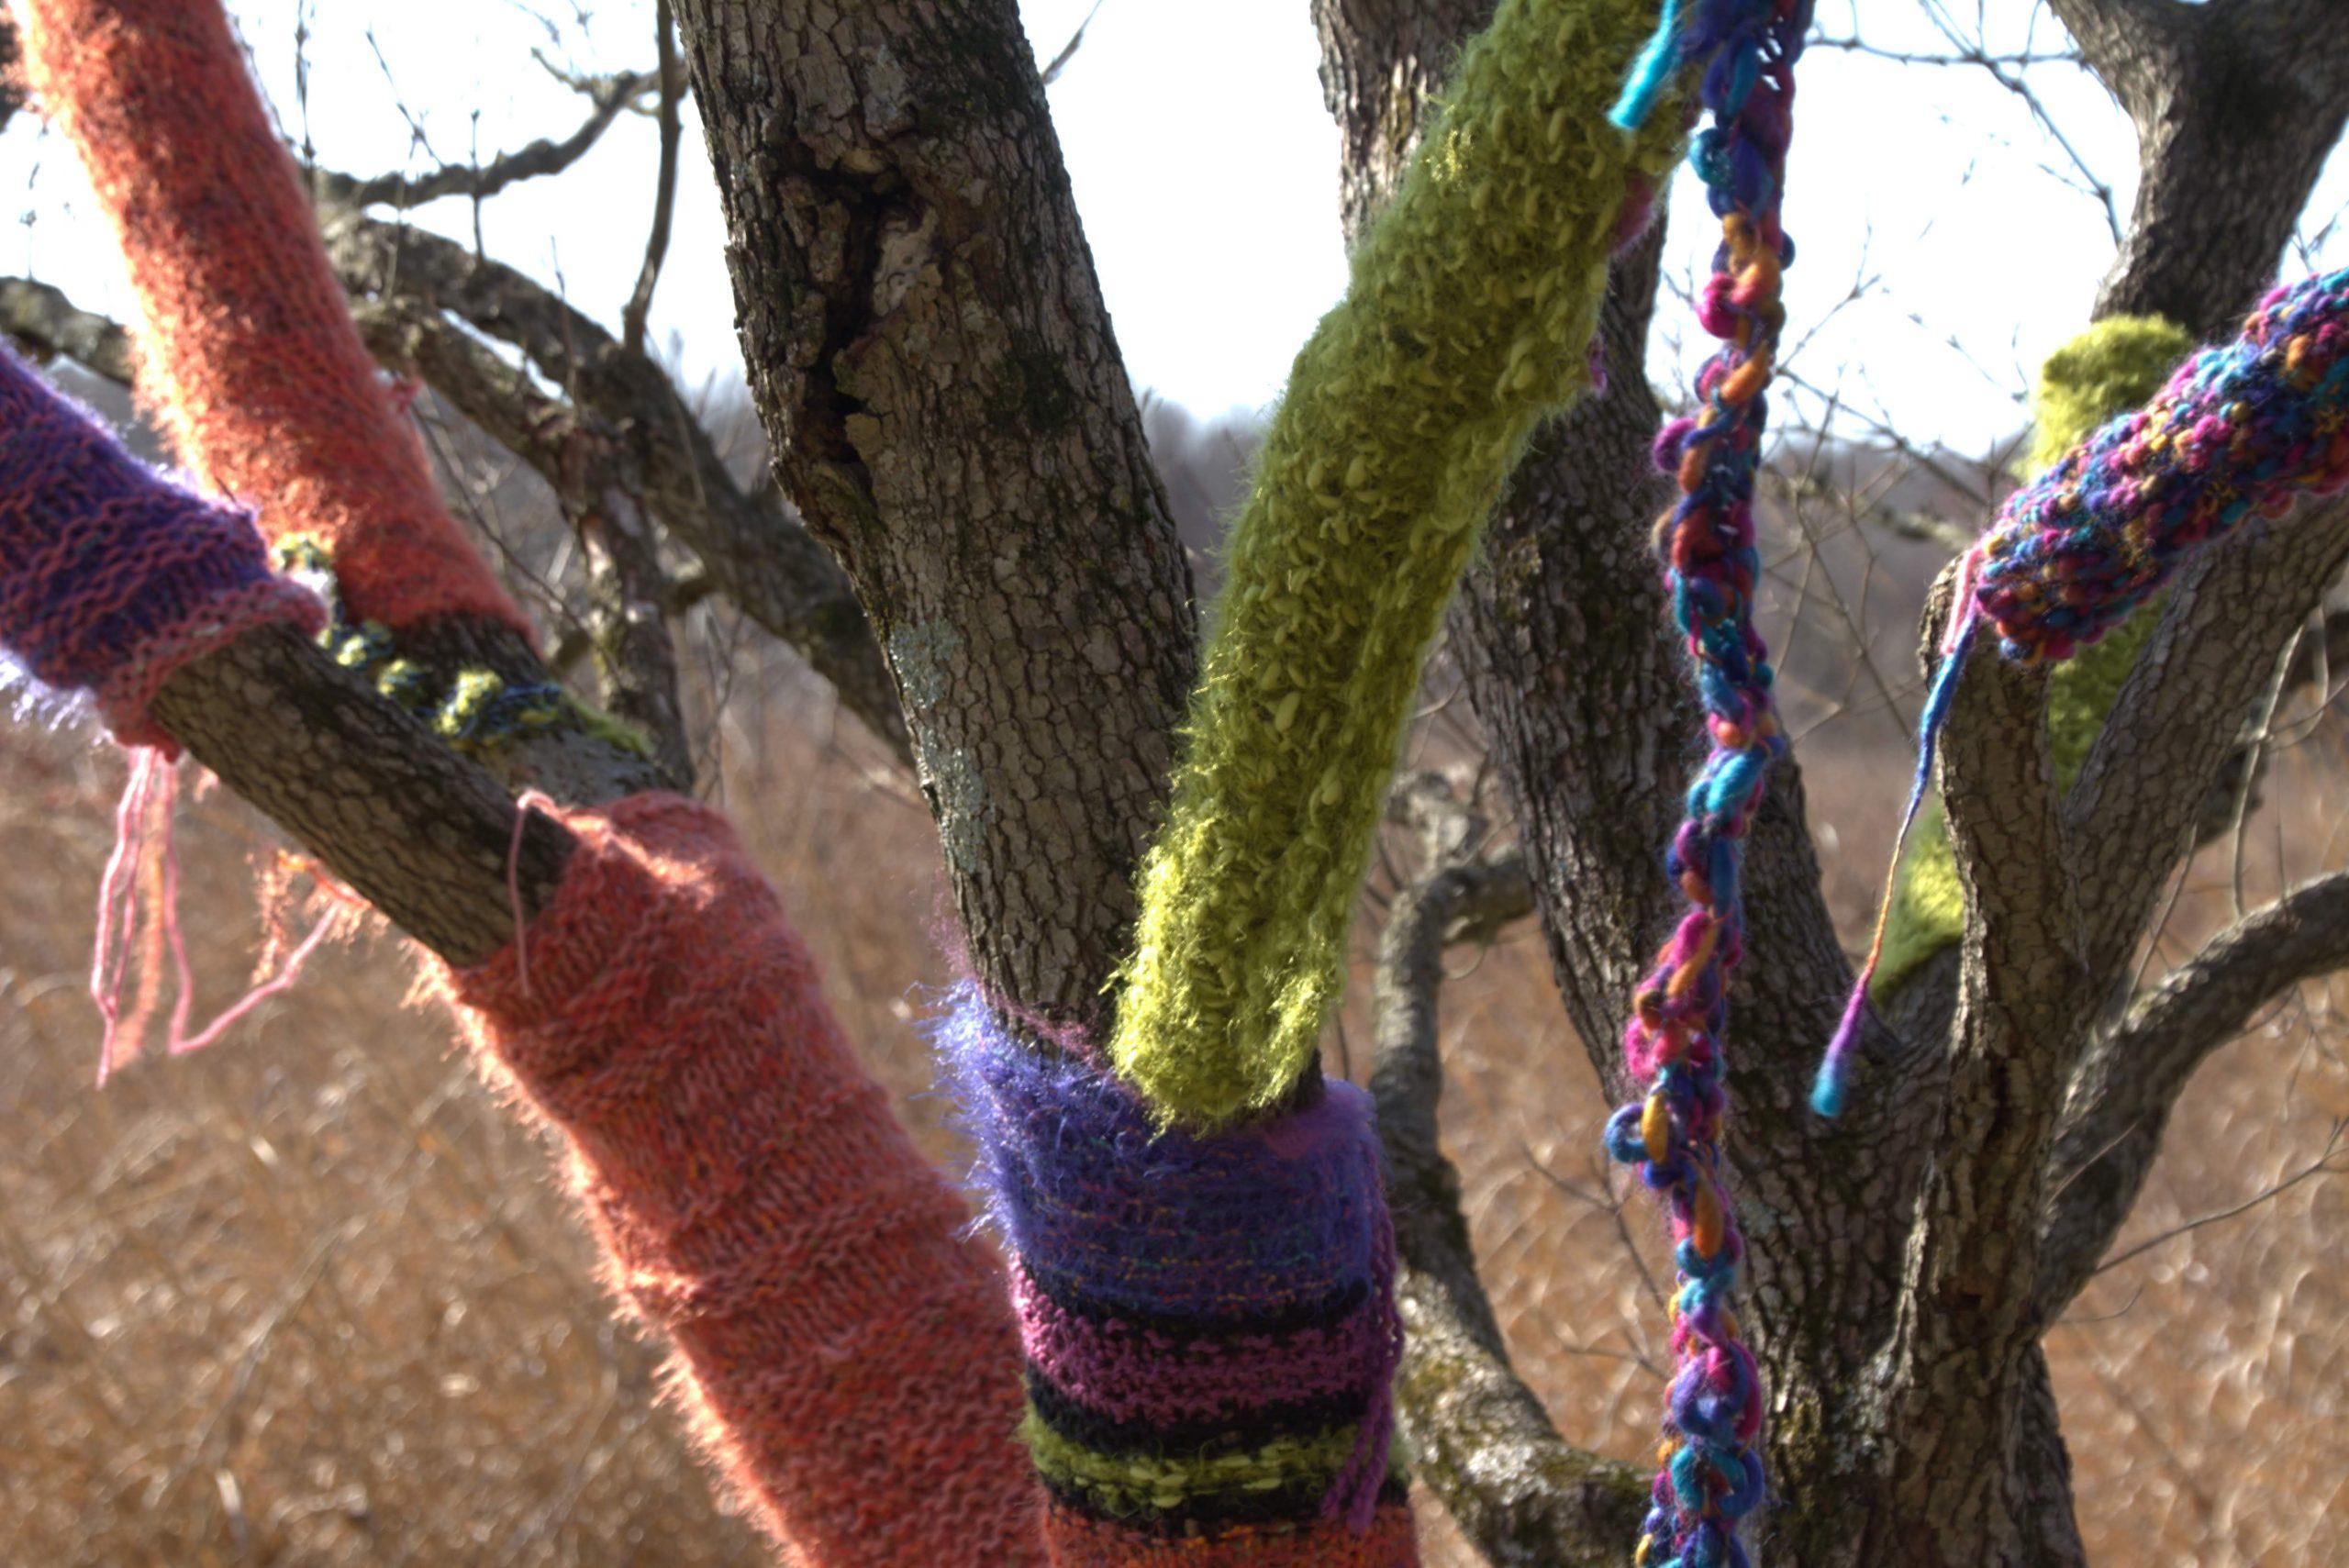 Yarnstorming Returns to Adkins Arboretum